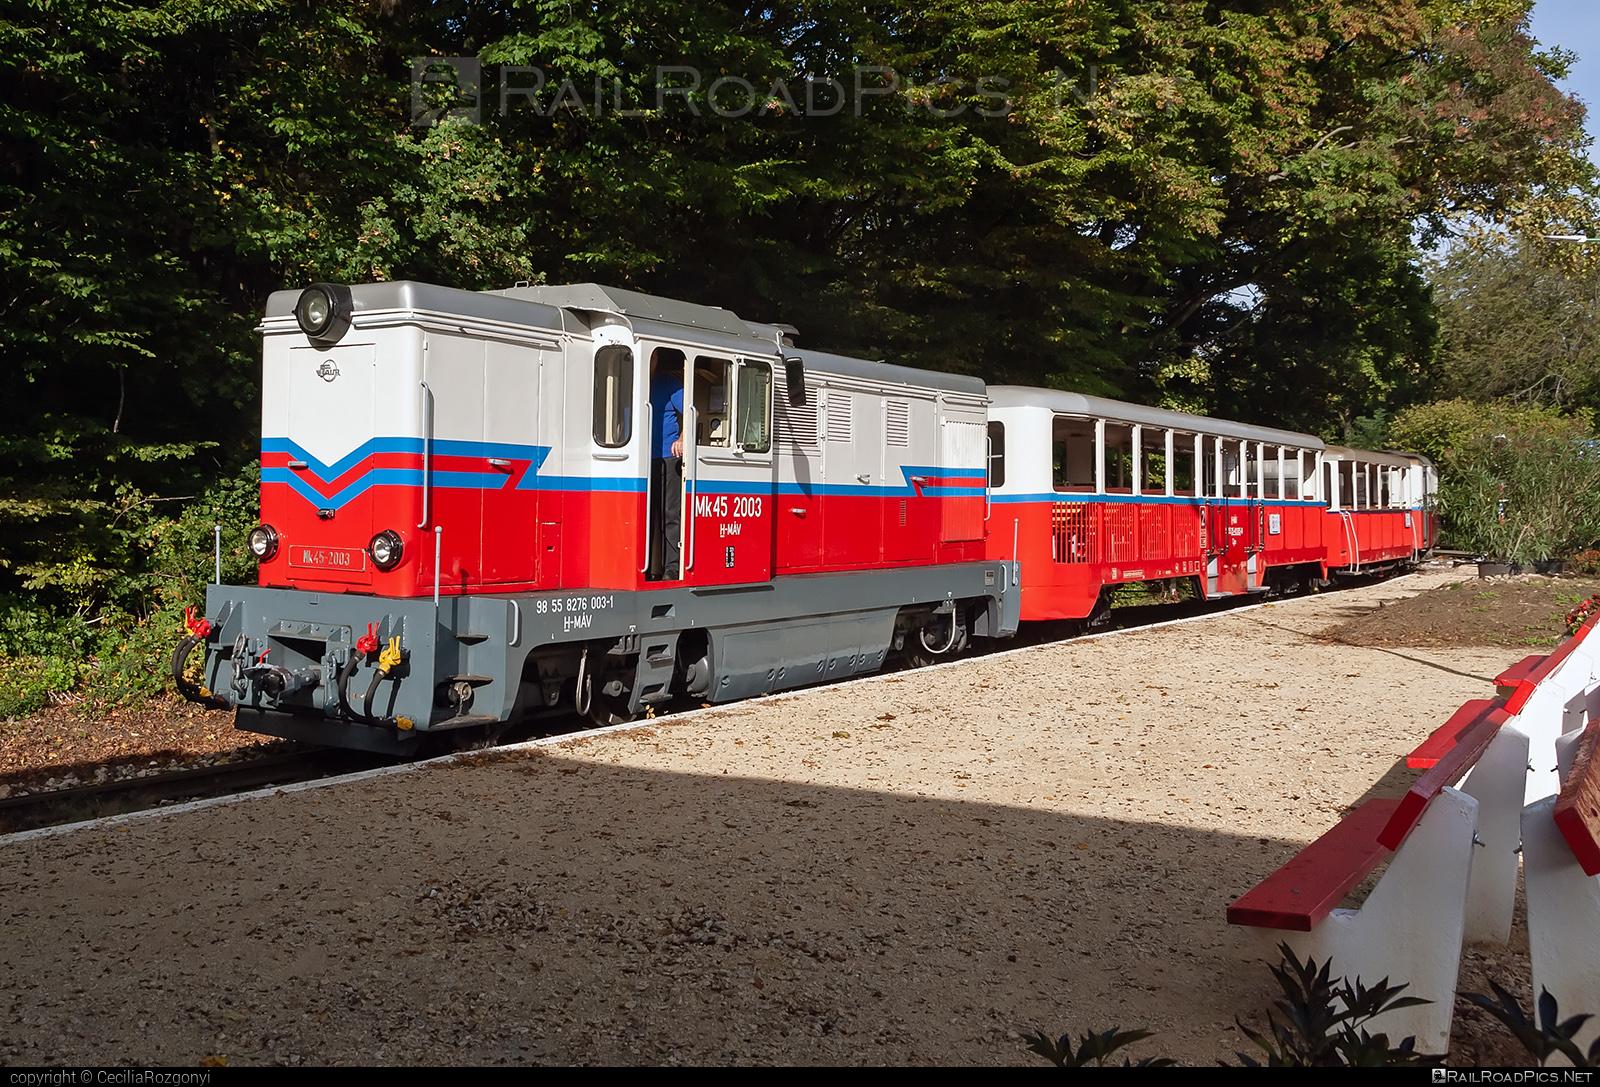 23 August Works (FAUR) L45H - Mk45-2003 operated by Magyar Államvasutak ZRt. #23augustworks #faur #faurl45h #l45h #magyarallamvasutak #magyarallamvasutakzrt #mav #uzinele23august